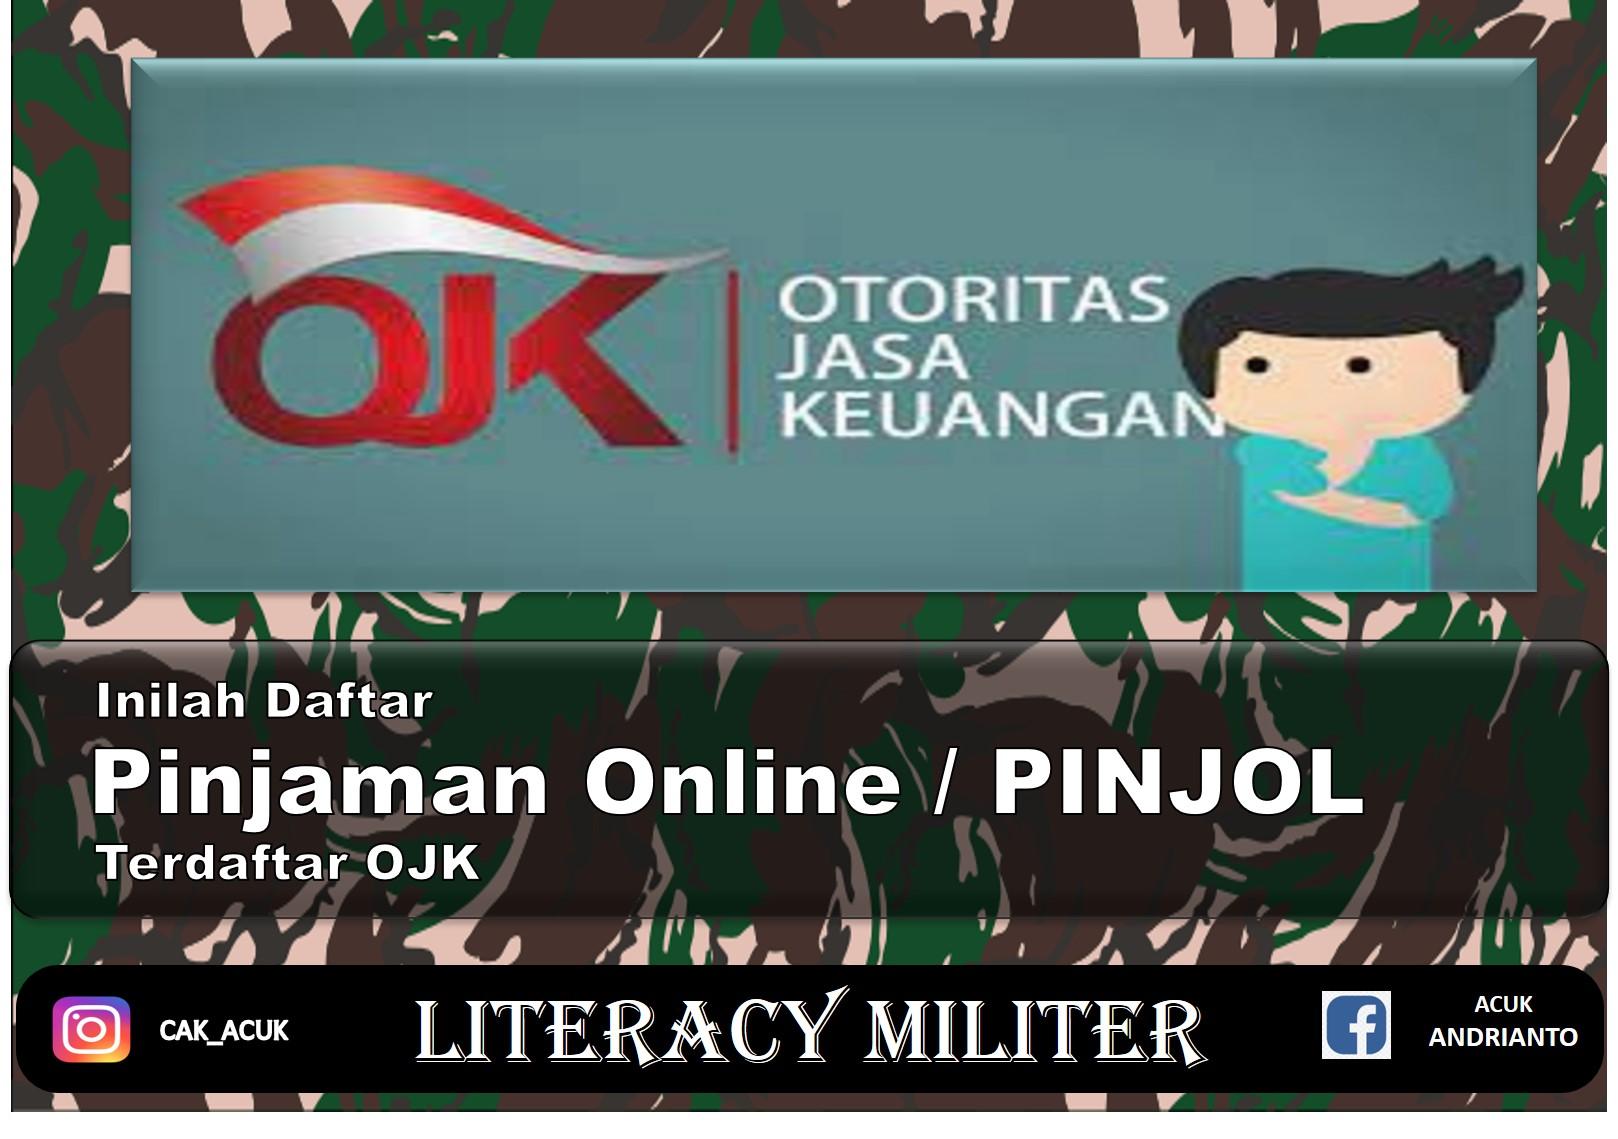 Pinjaman Online Pinjol Legal Terdaftar Ojk Literacy Militer